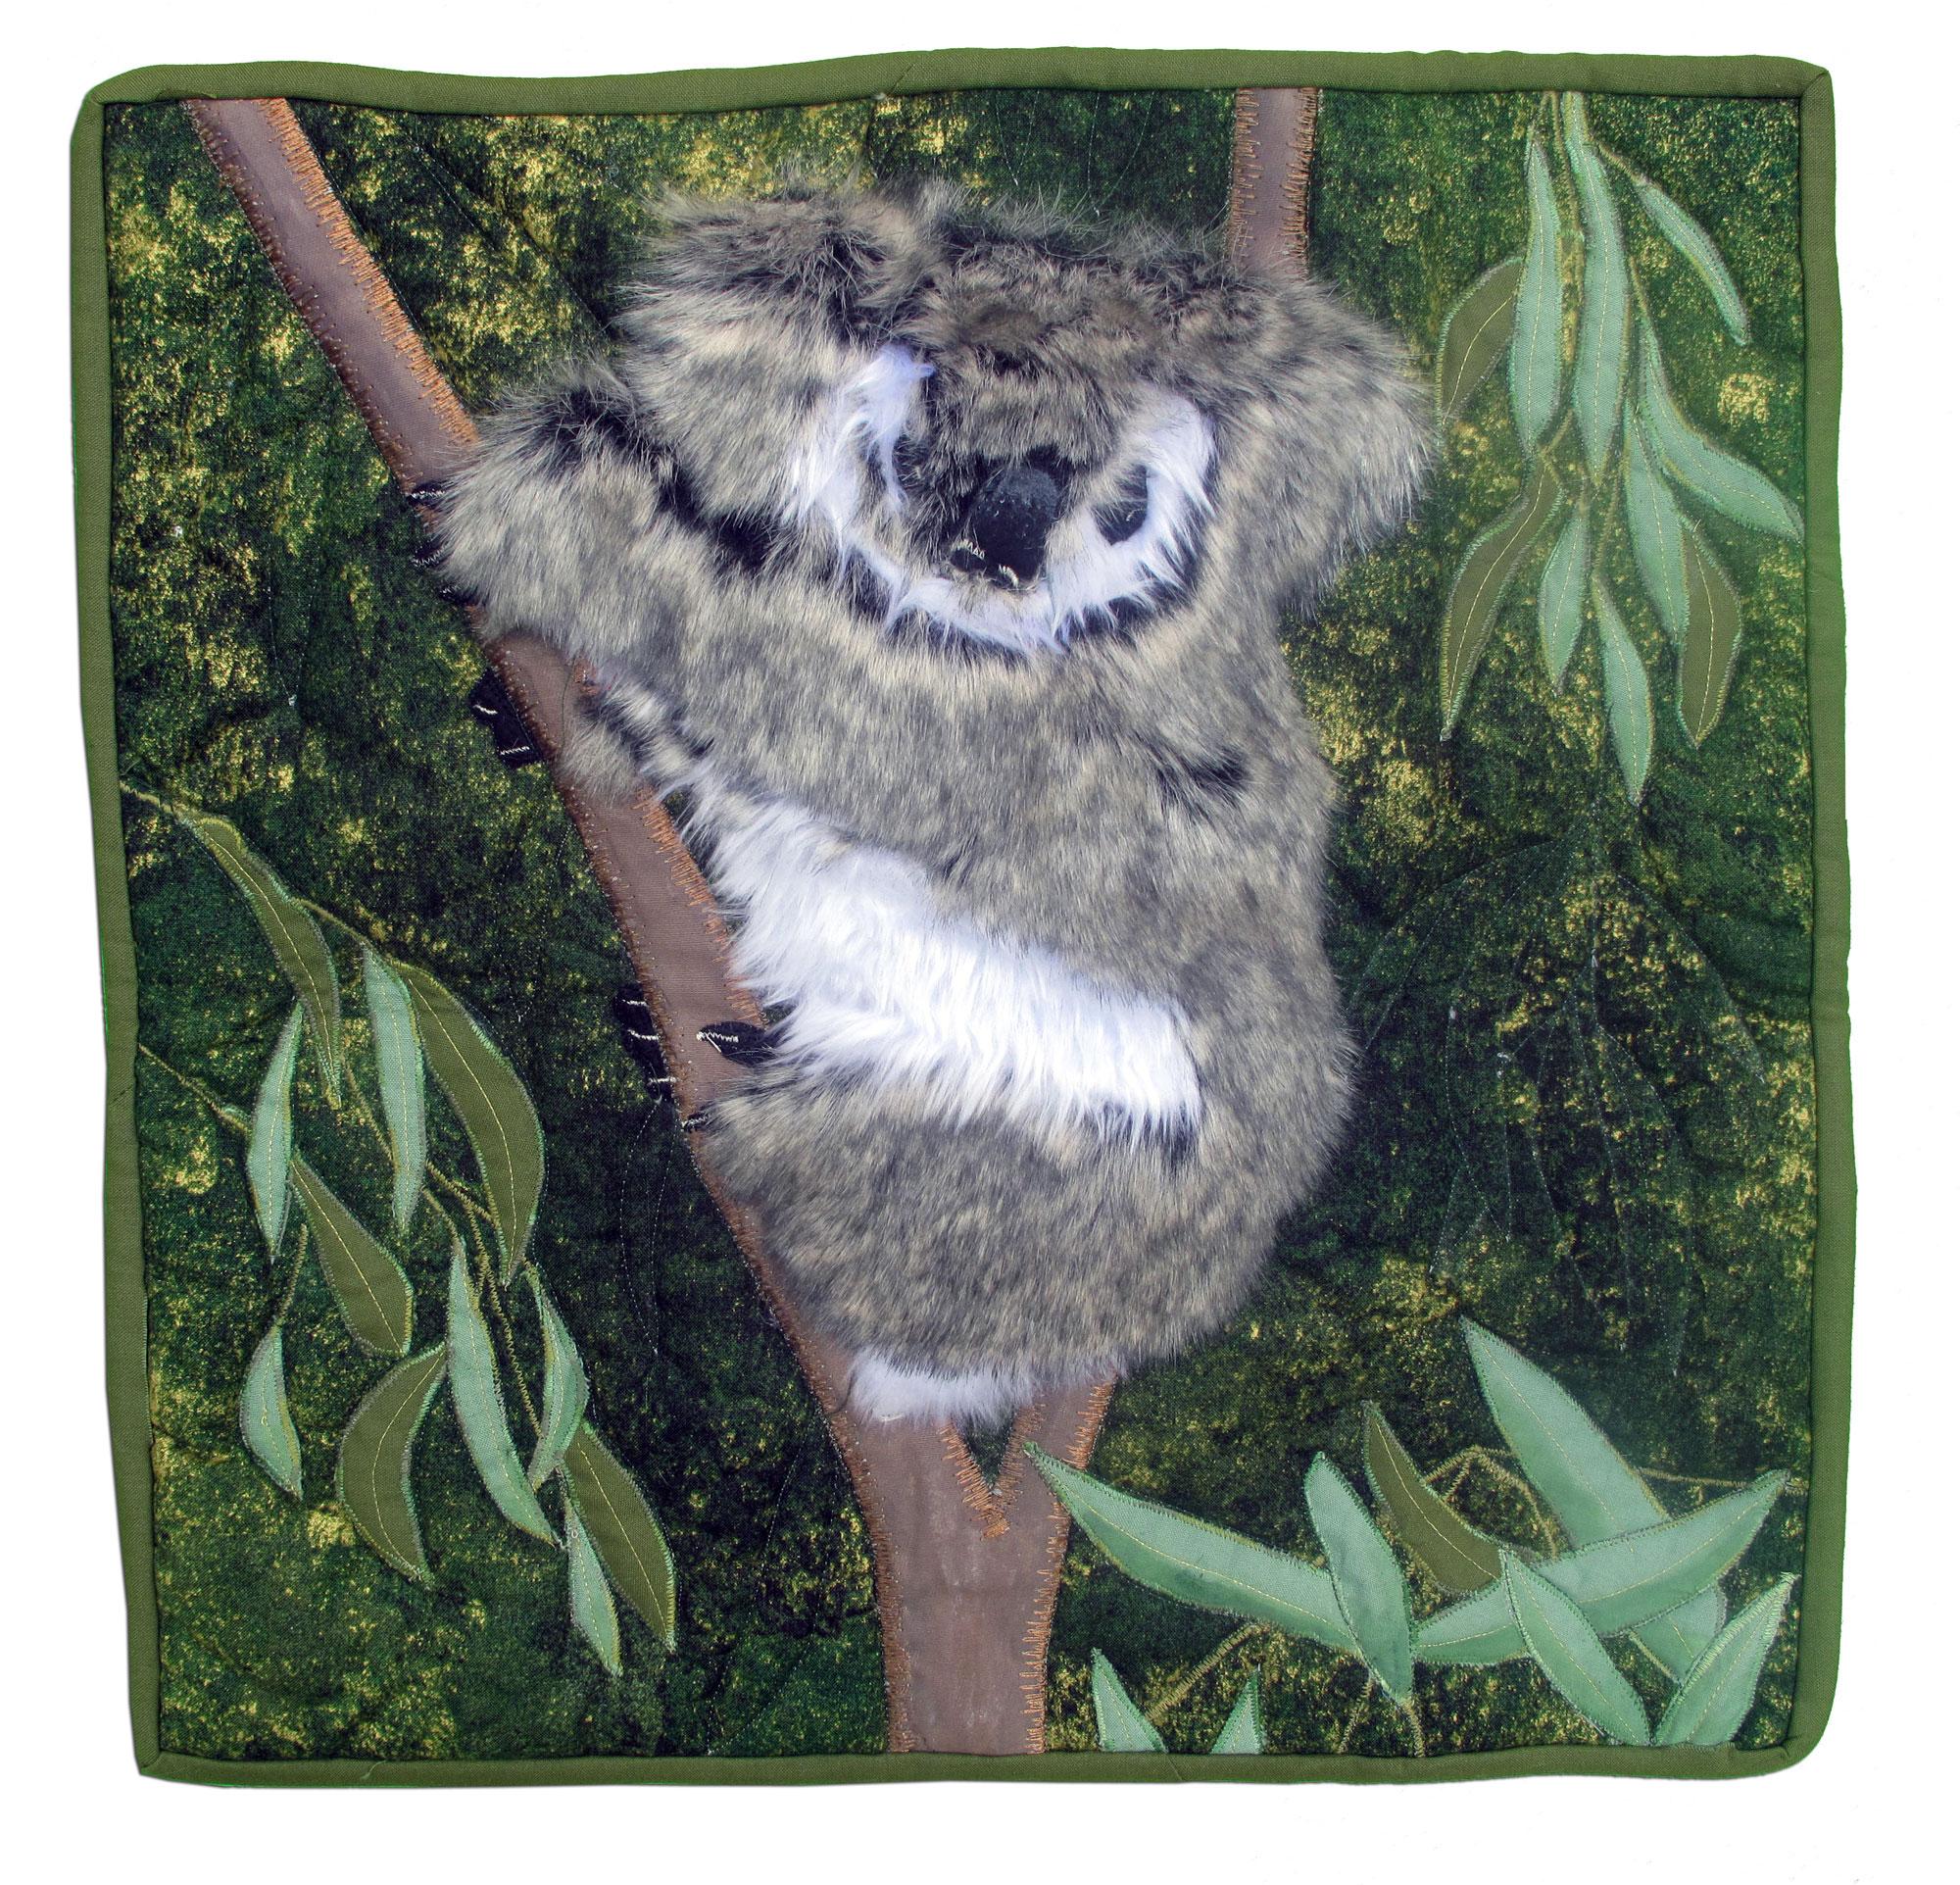 Cuddly Koala, Desley M. Drevins, Albany Creek, Queensland, Australia